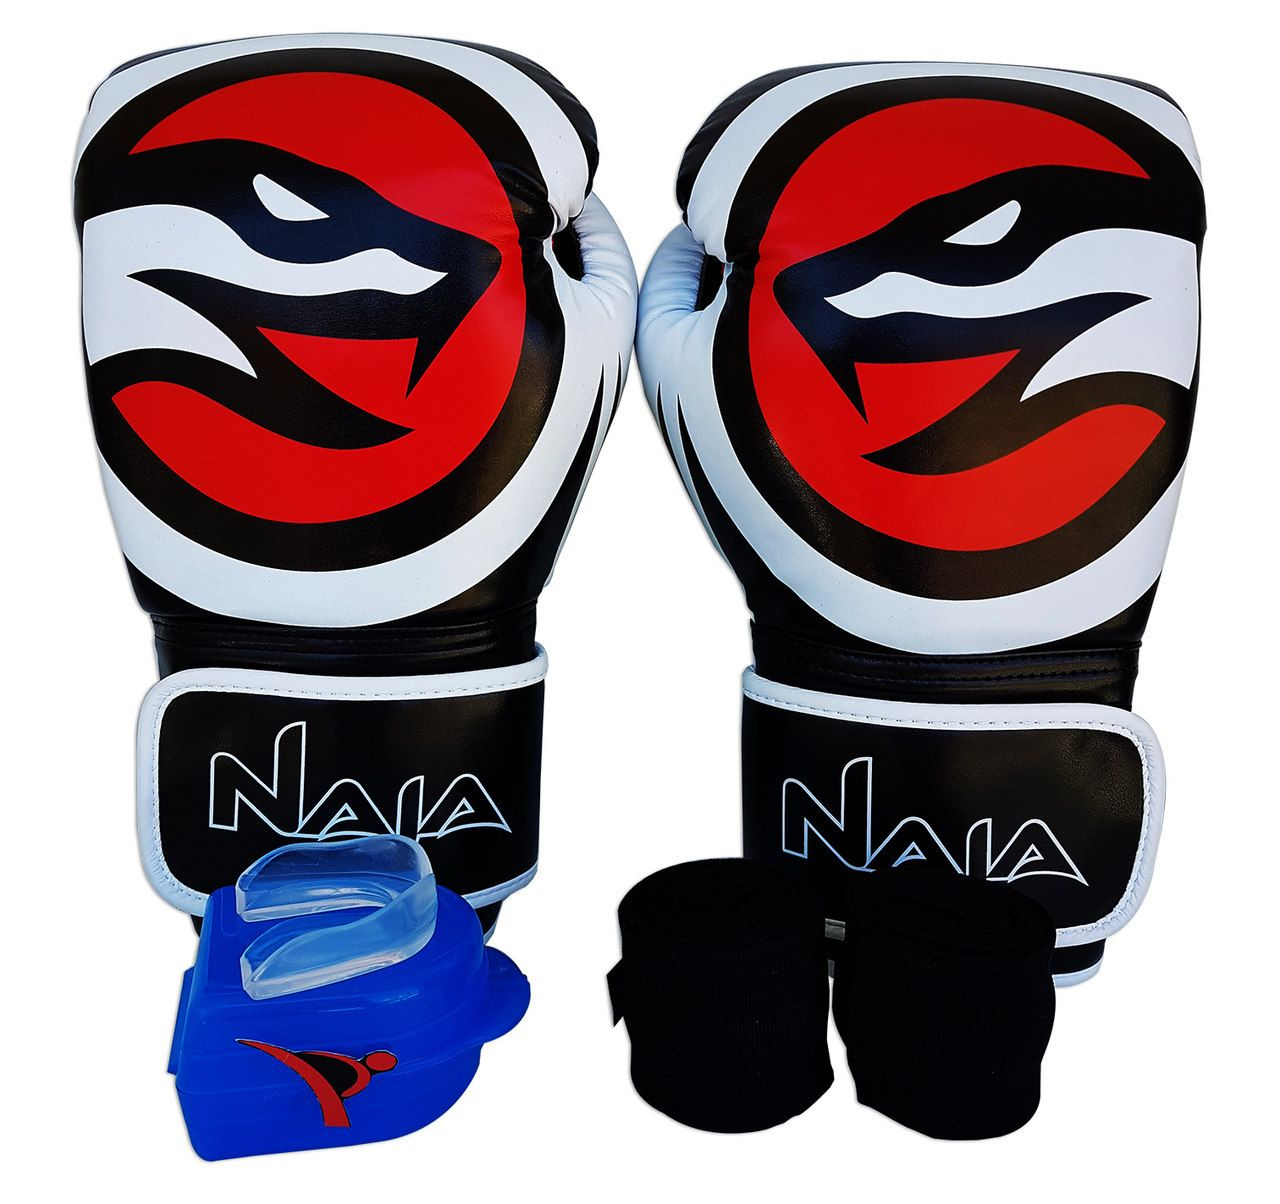 Kit De Boxe / Muay Thai 16oz - Preto - OPP - Naja  - PRALUTA SHOP